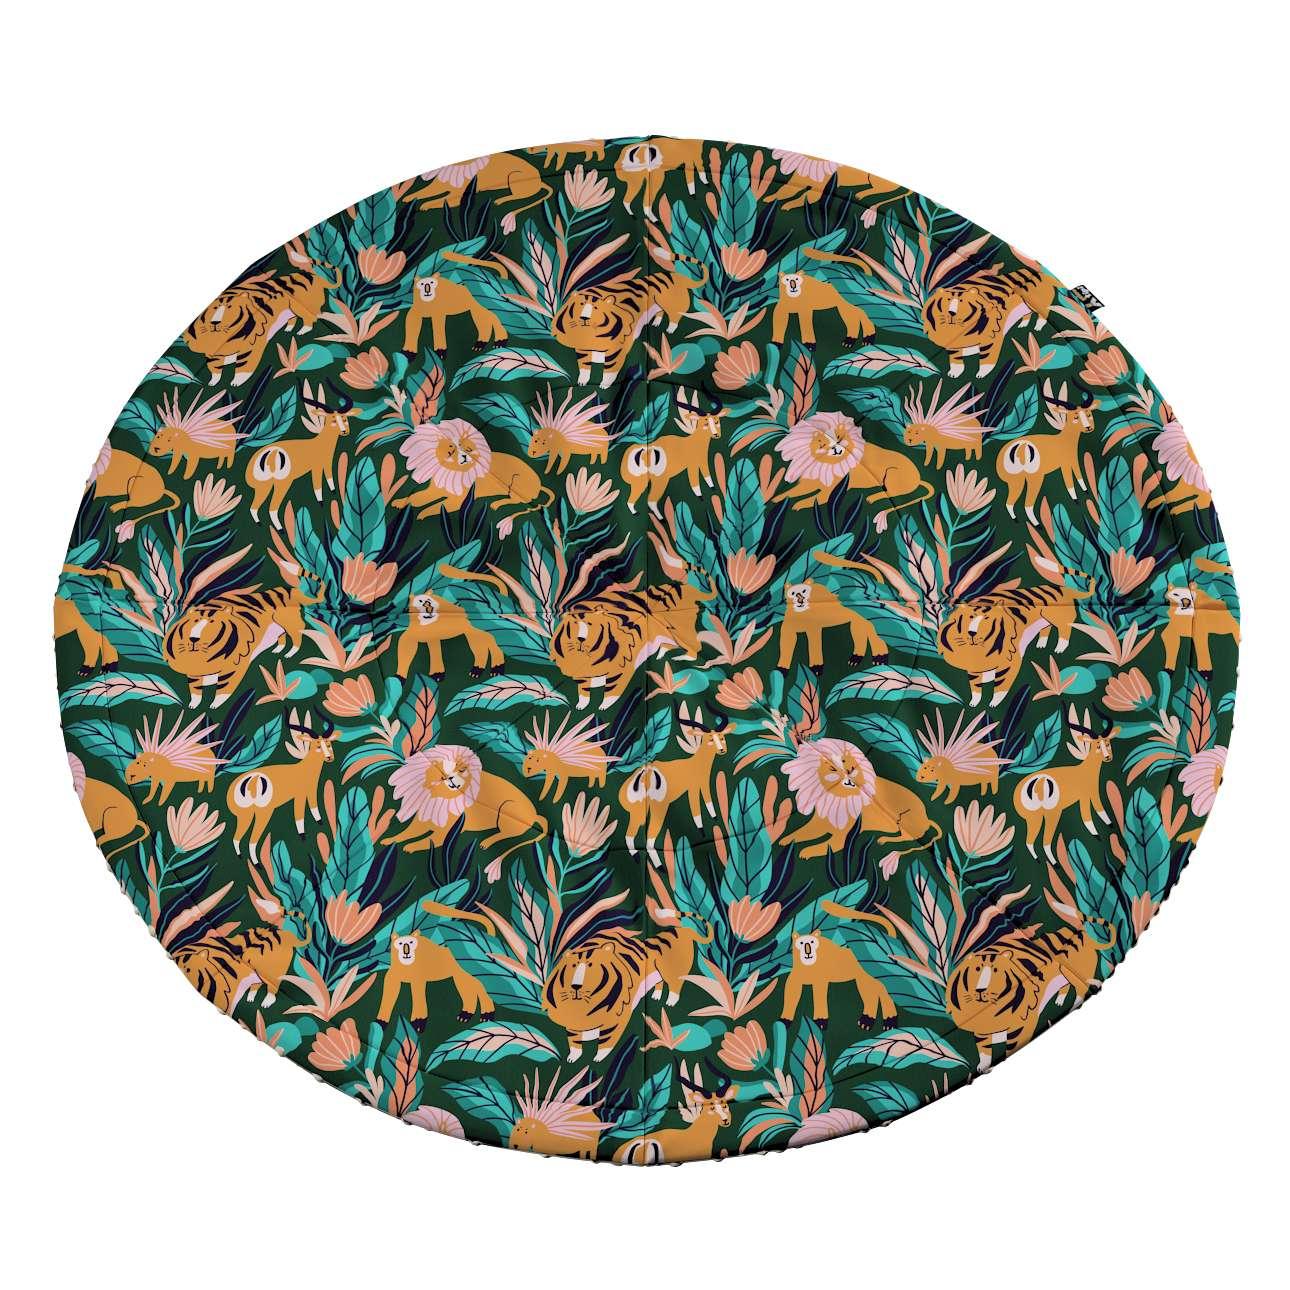 Apvalus kilimėlis kolekcijoje Magic Collection, audinys: 500-42